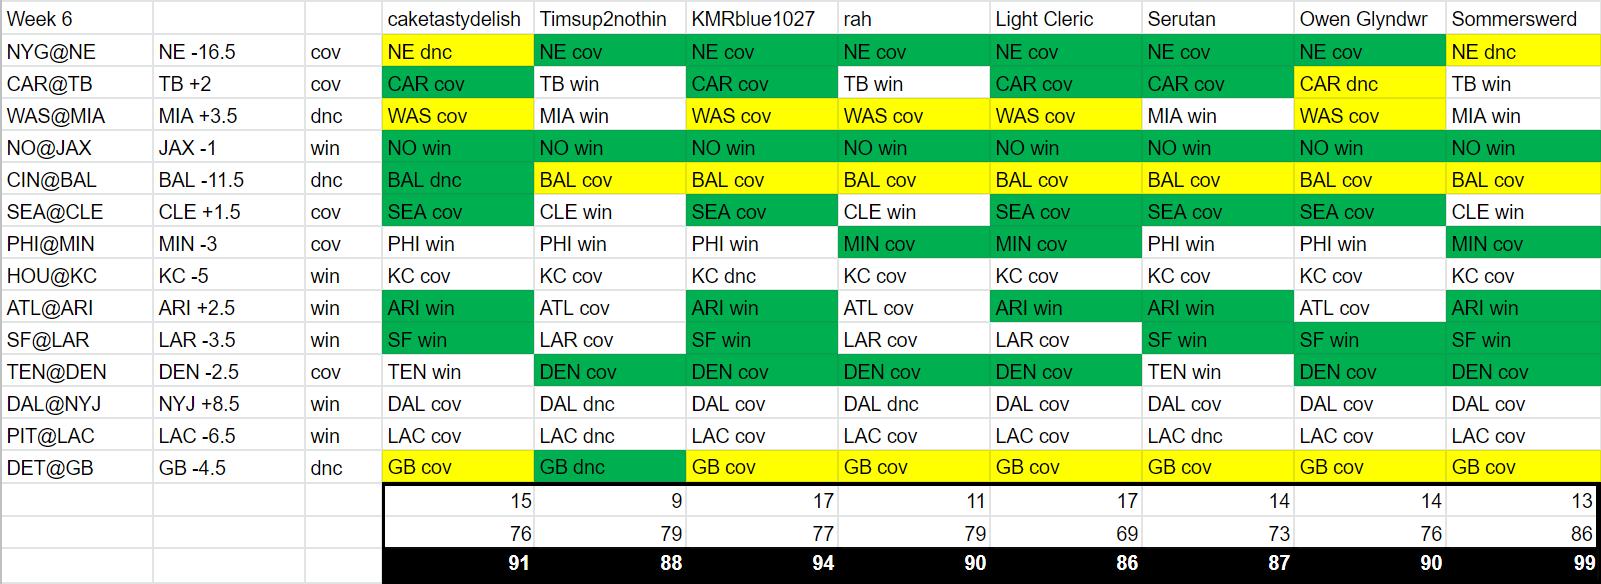 Week 6 Results.png